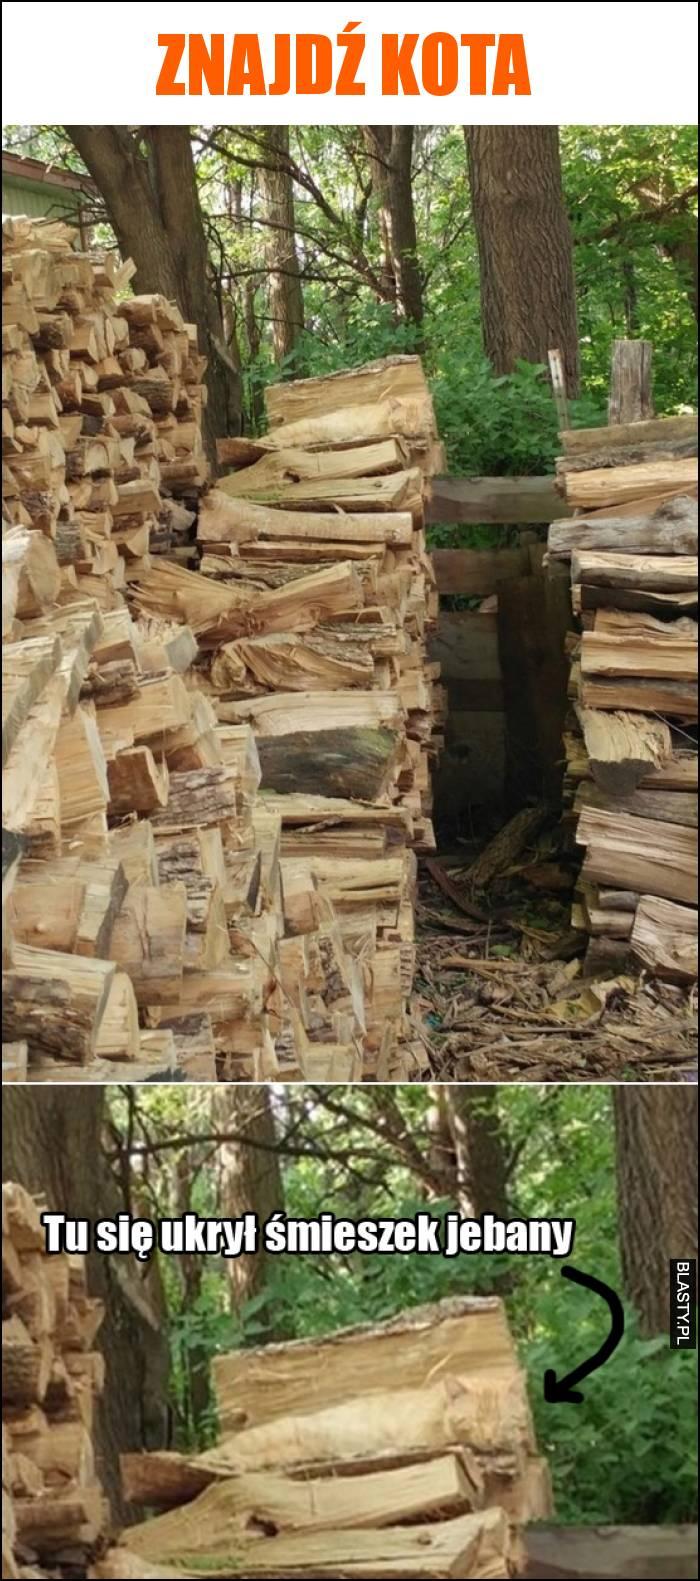 Znajdź kota